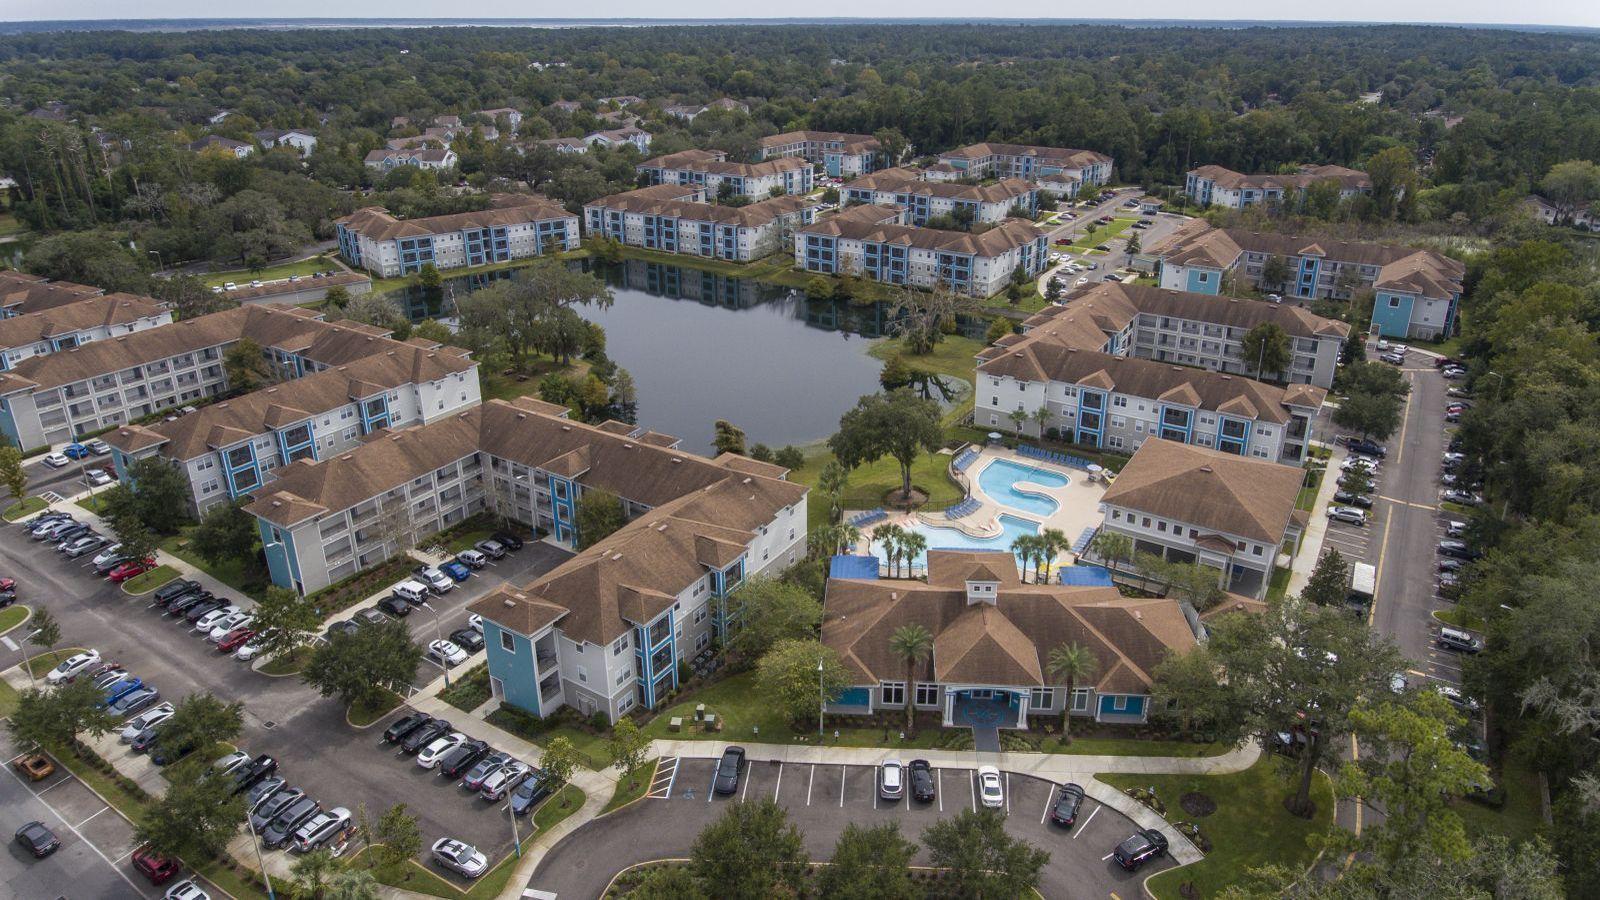 4 bedroom apartments in gainesville fl apartmentsingainesville com 4 bedroom apartments in gainesville fl